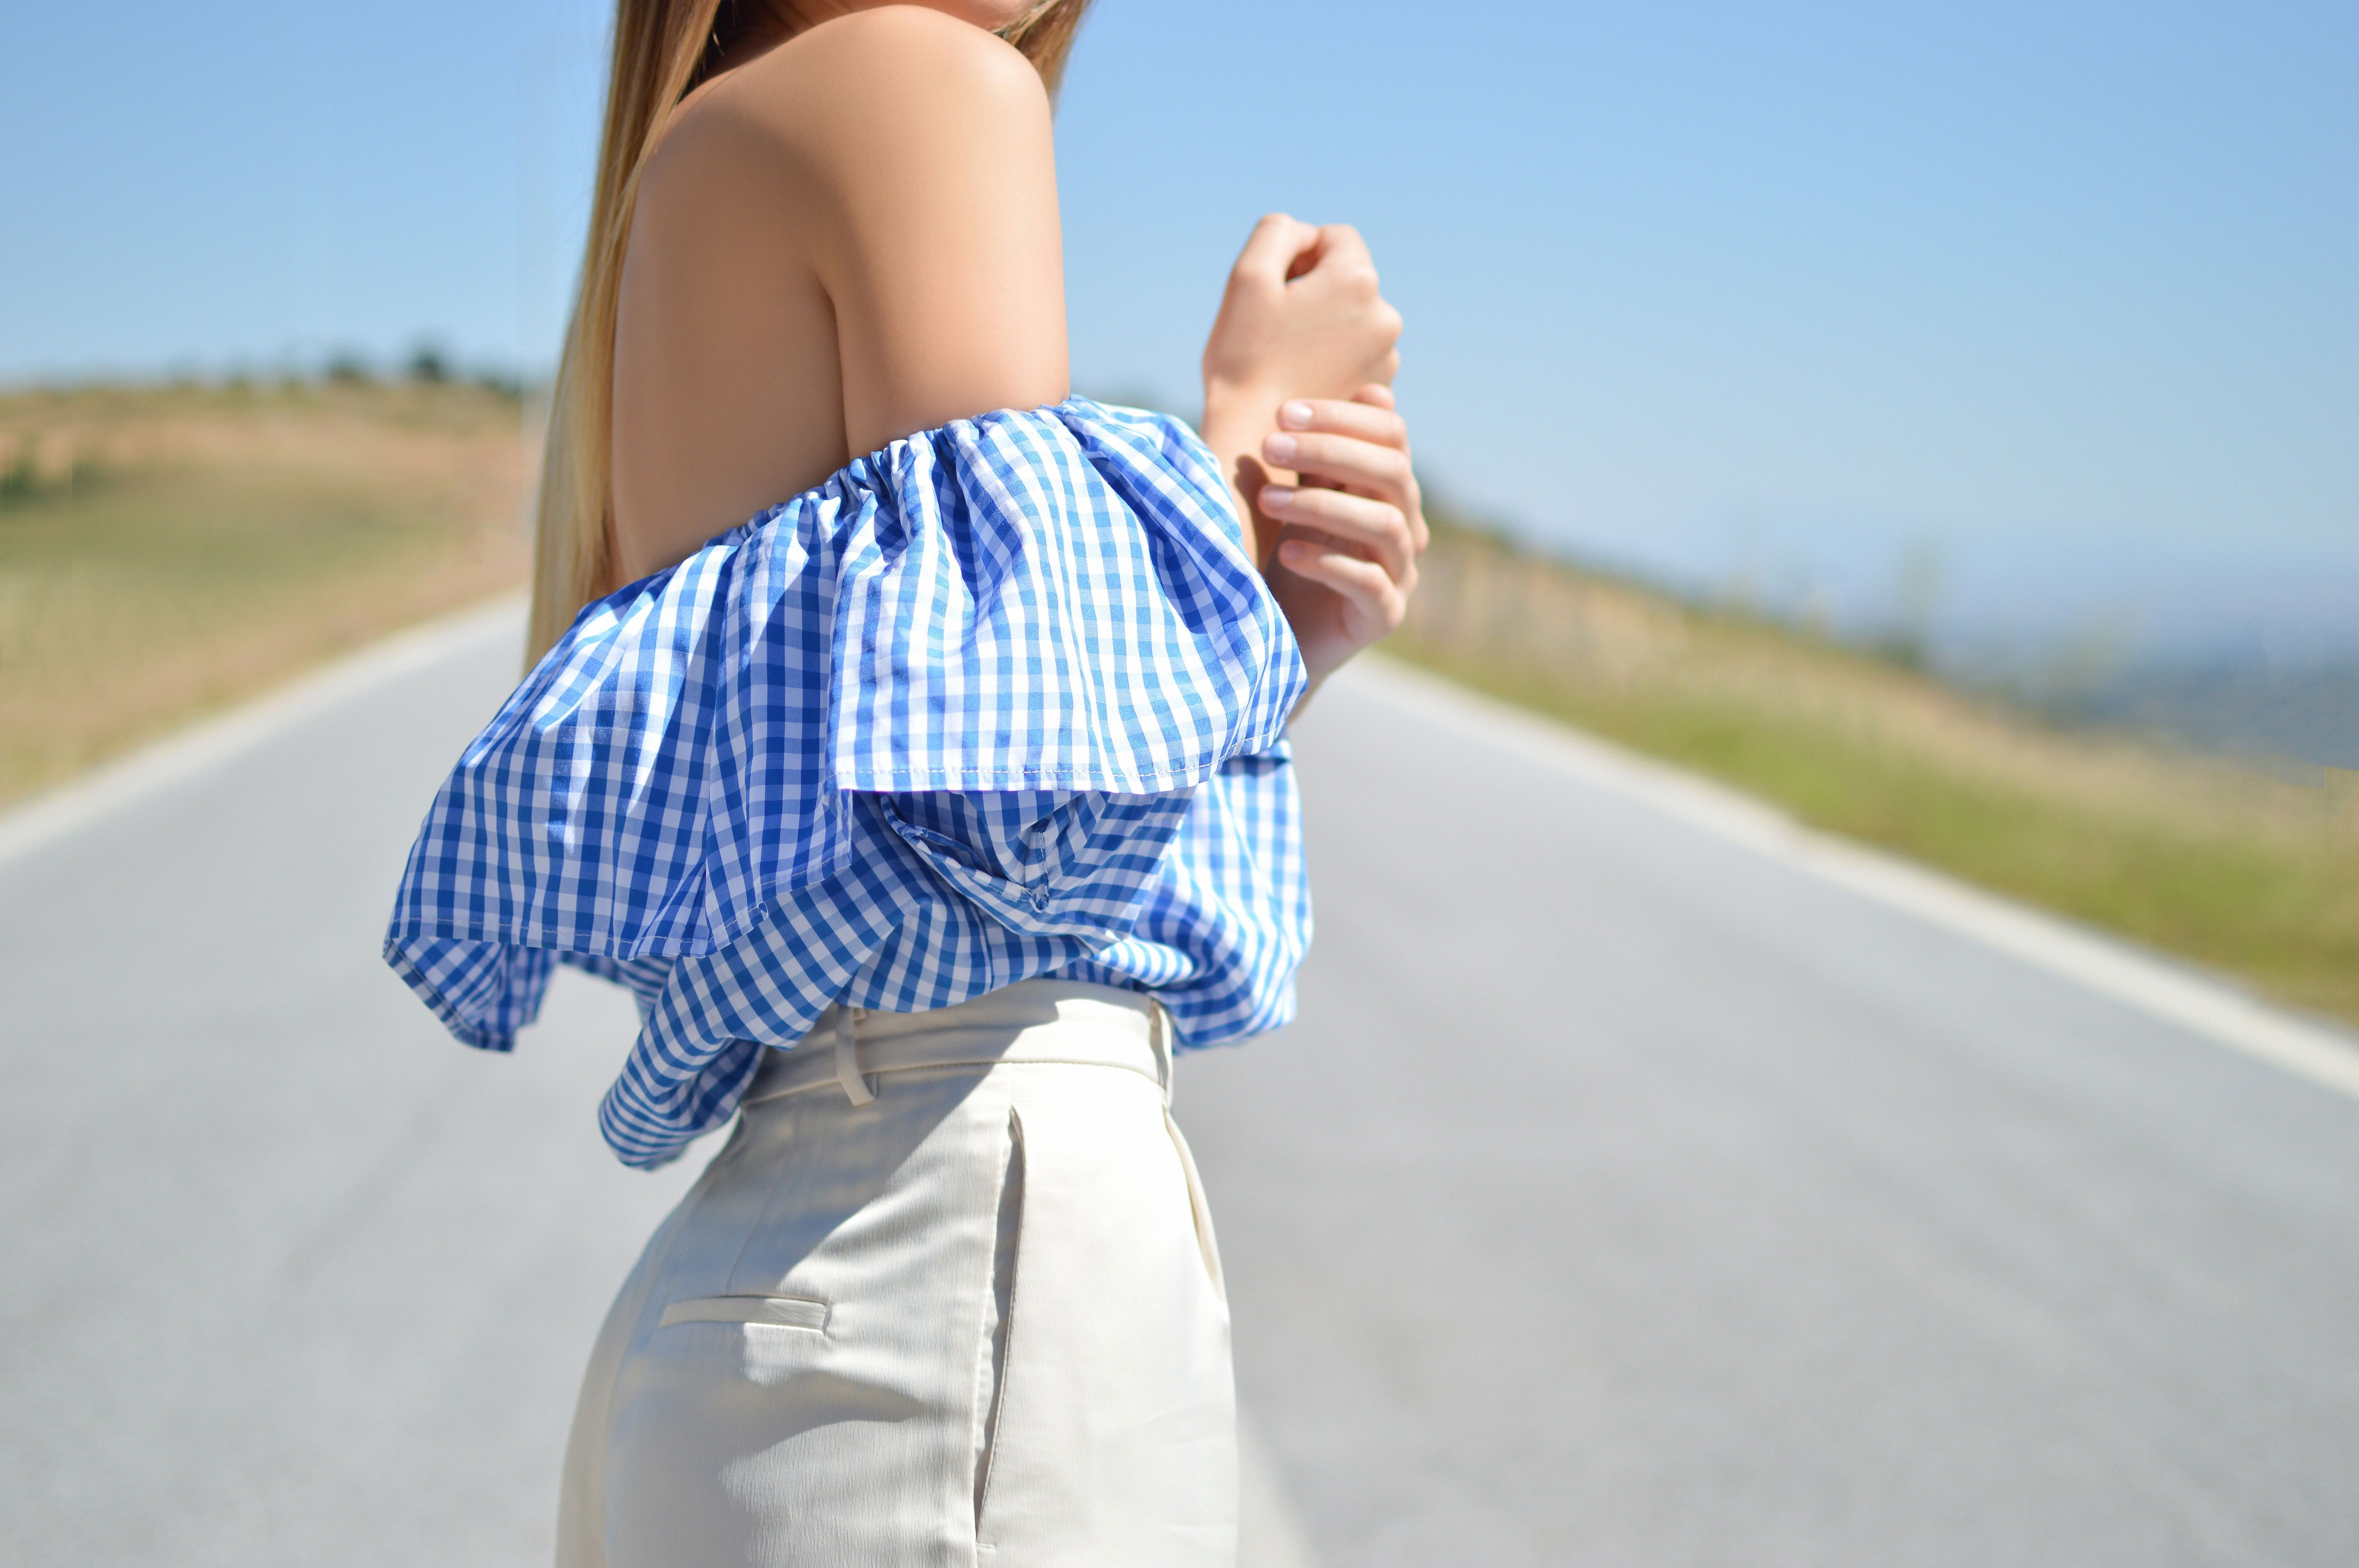 tendencias de moda hombros al descubierto